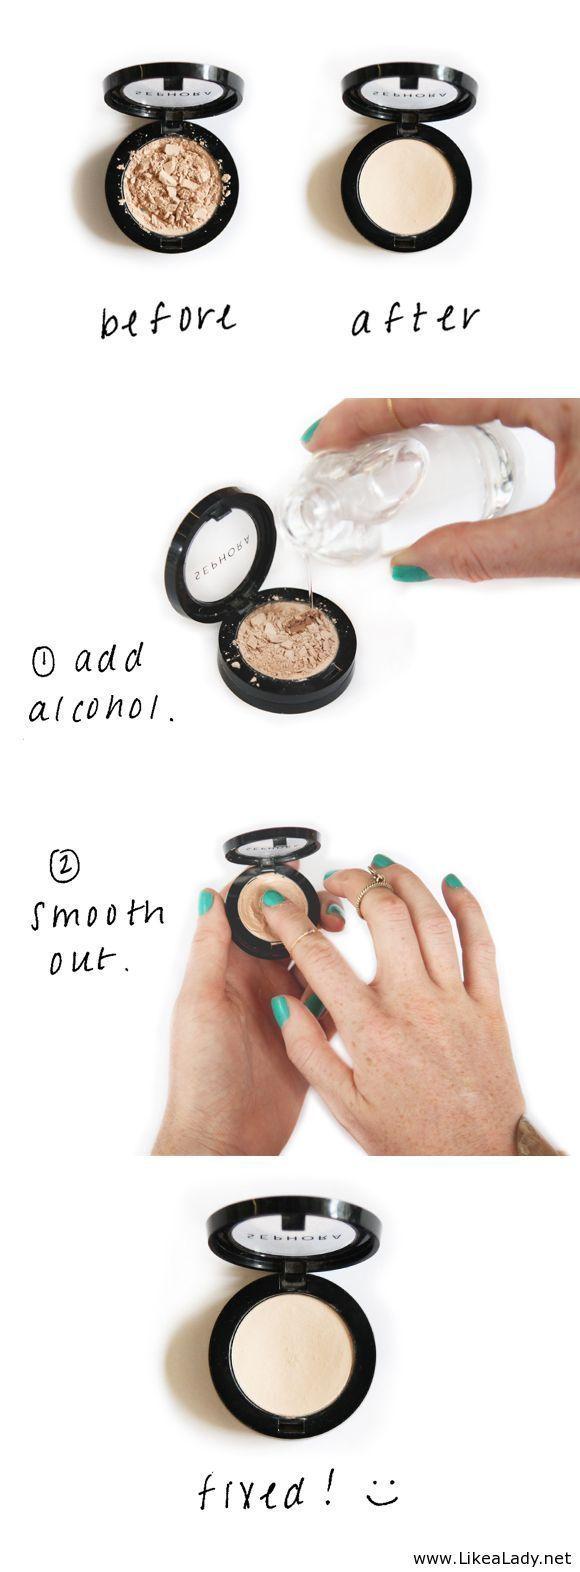 How to Fix Your Broken Eyeshdow http://thedailymark.com.au/beauty/fix-broken-eyeshadow